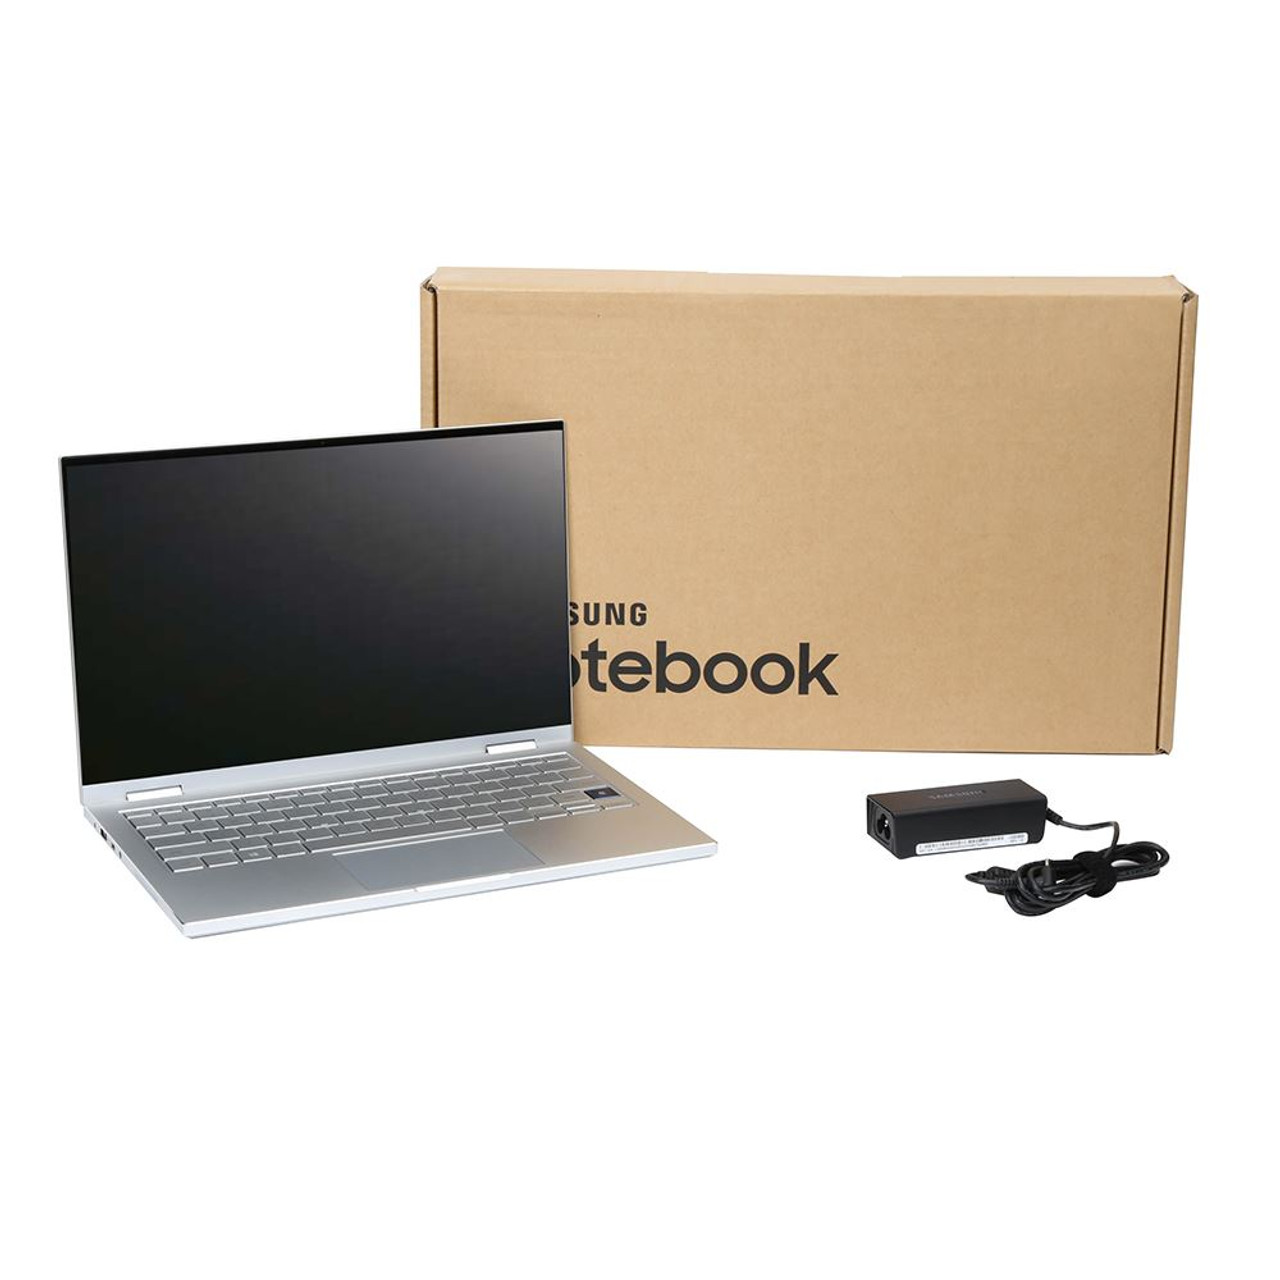 Samsung Galaxy Book Flex a 2-in-1 13.3 Laptop Computer - Silver Intel Core i5-10210U Processor 1.6GHz; 8GB RAM; 256GB Solid State Drive; Intel UHD Graphics